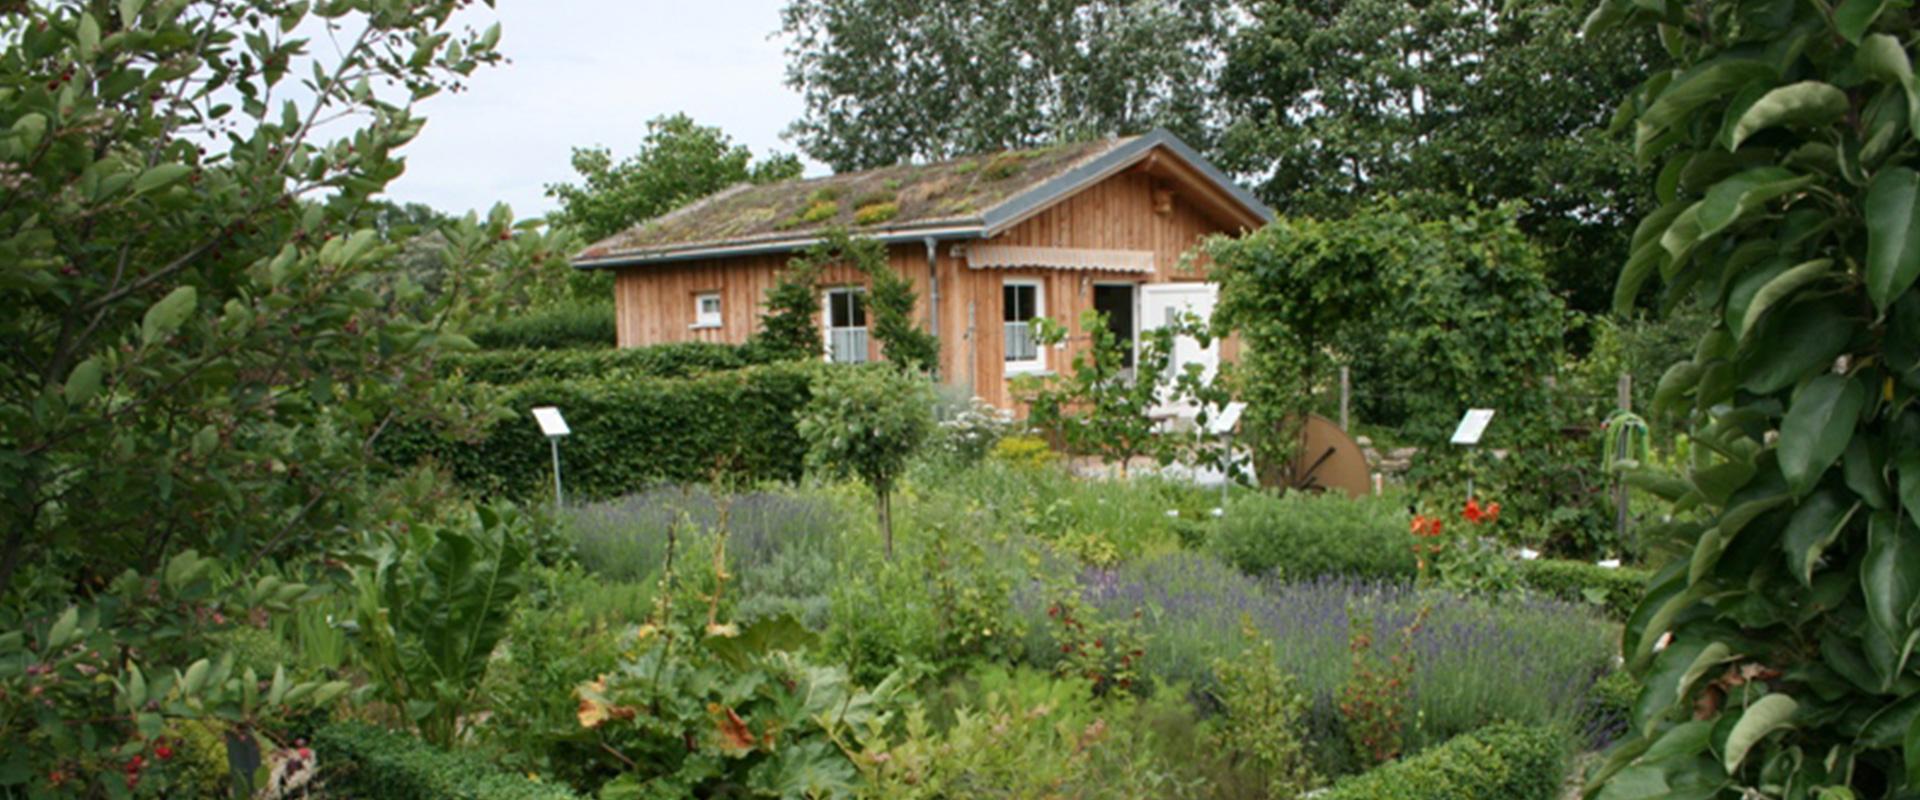 Gartenerlebnis-Bayern-Wolfgang-Settmacher-Krumm-Kreislehrgarten-Oberhaid